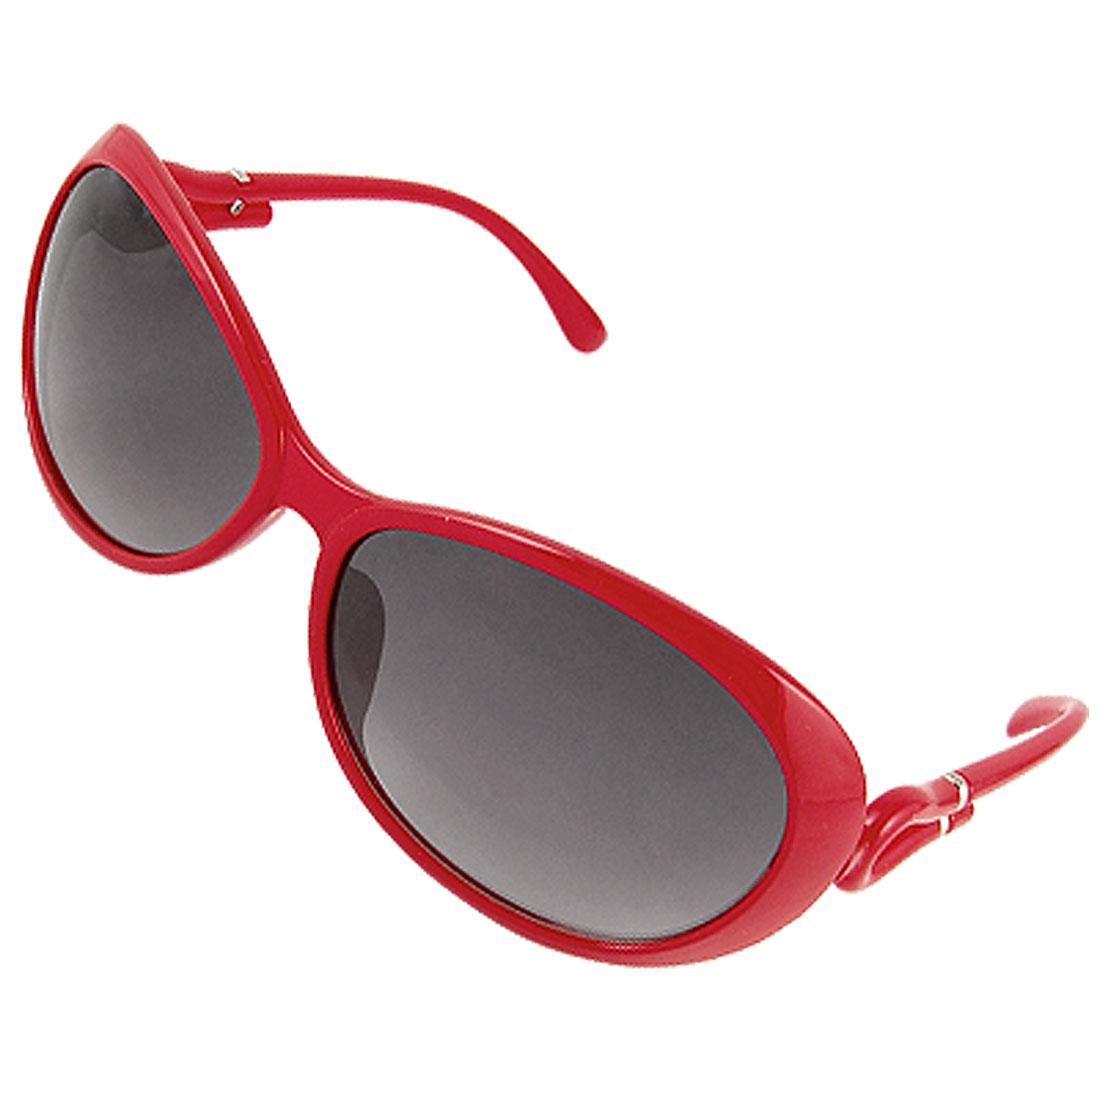 Red Plastic Full Frame Slim Arms Sunglasses for Ladies